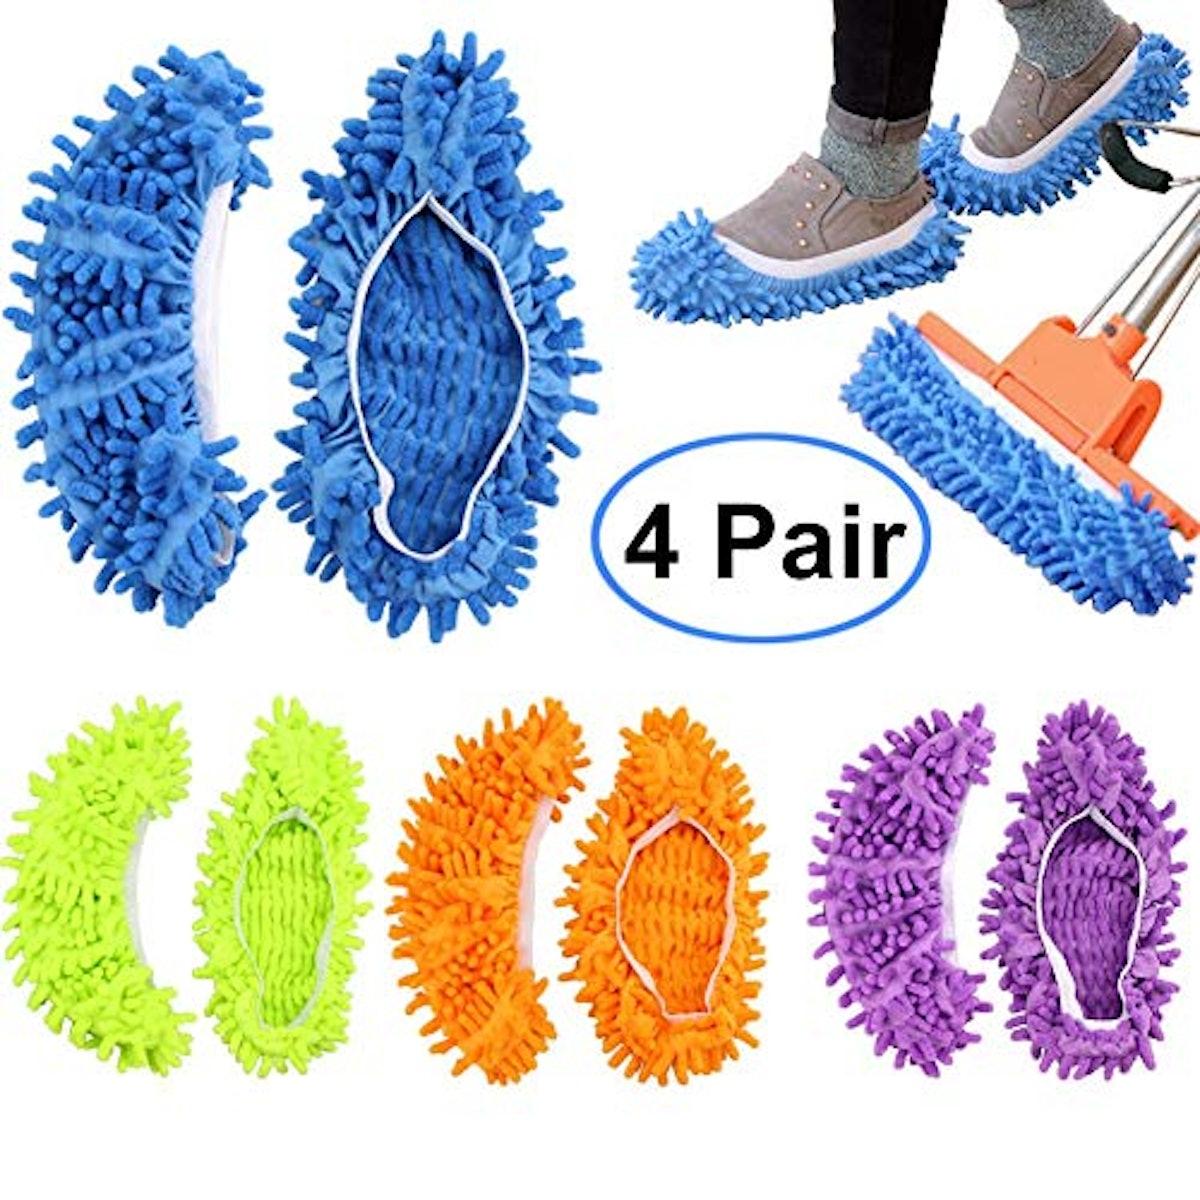 FEATHERHEAD Bontip 4 Pairs (8 Pieces) Unisex Washable Dust Mop Slippers Shoes